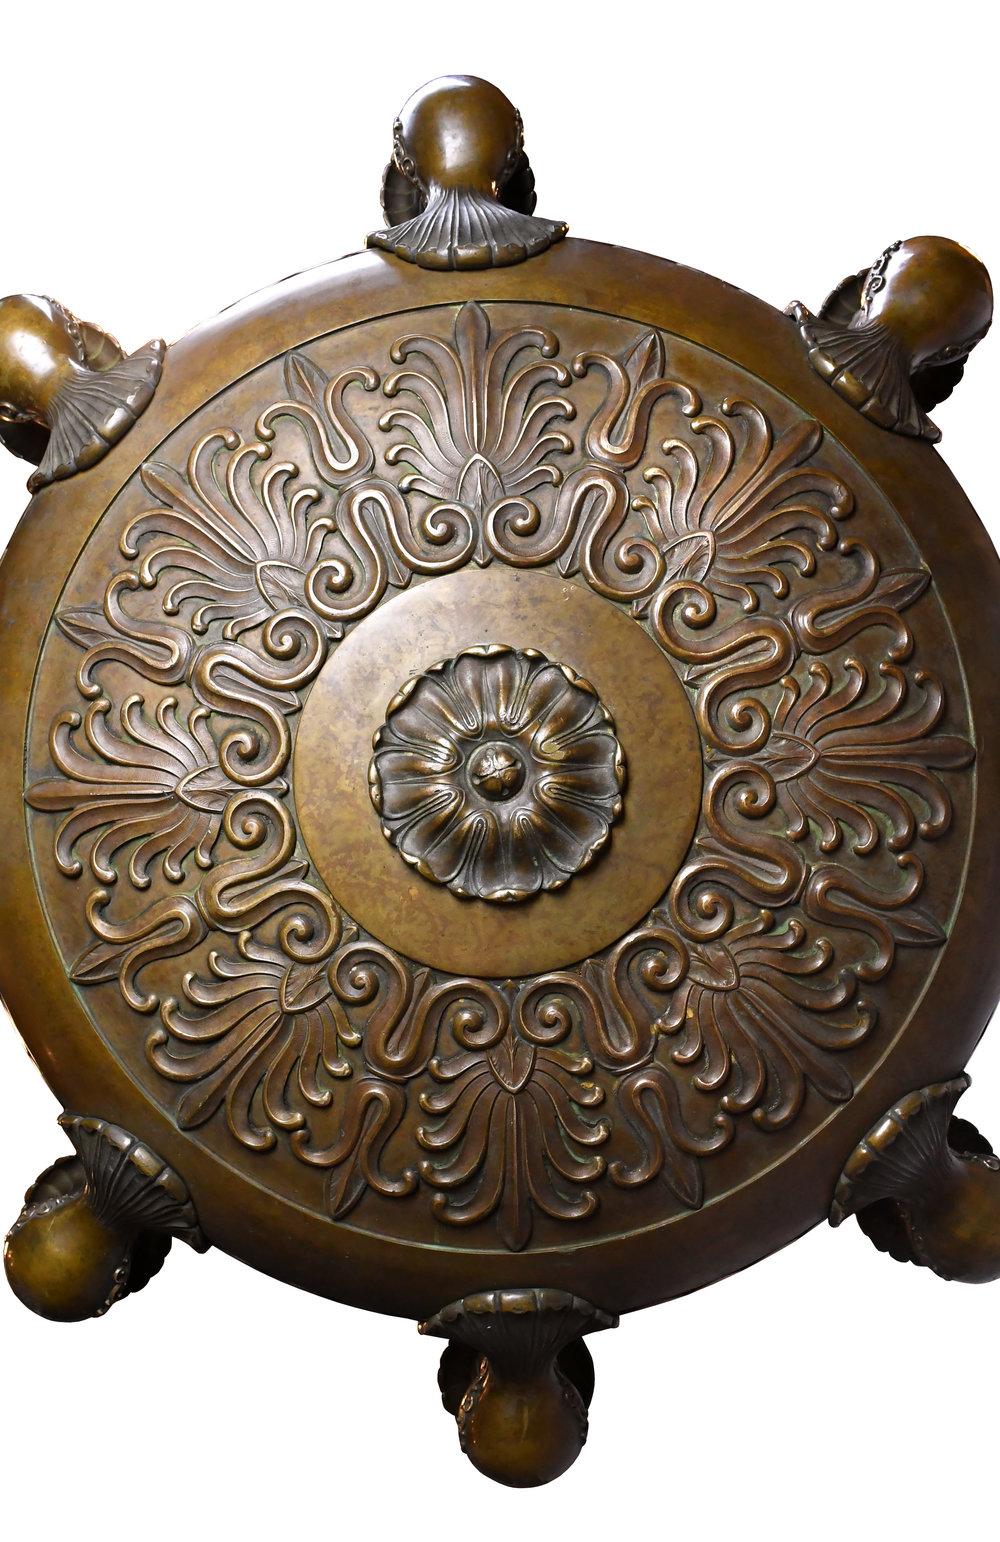 47590-cast-bronze-nine-light-chandelier-bottom-view.jpg